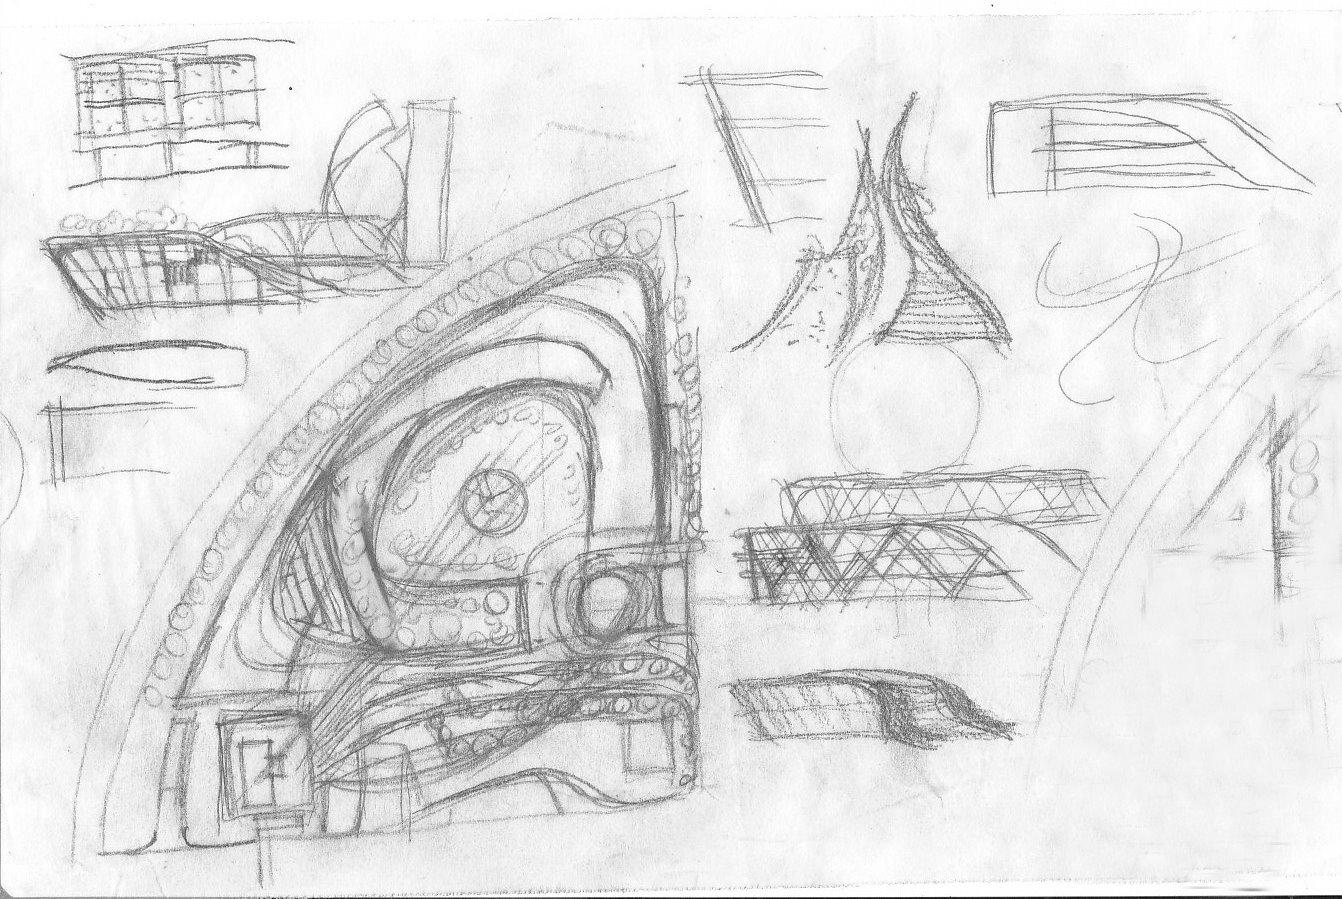 Concept design (Sketch)